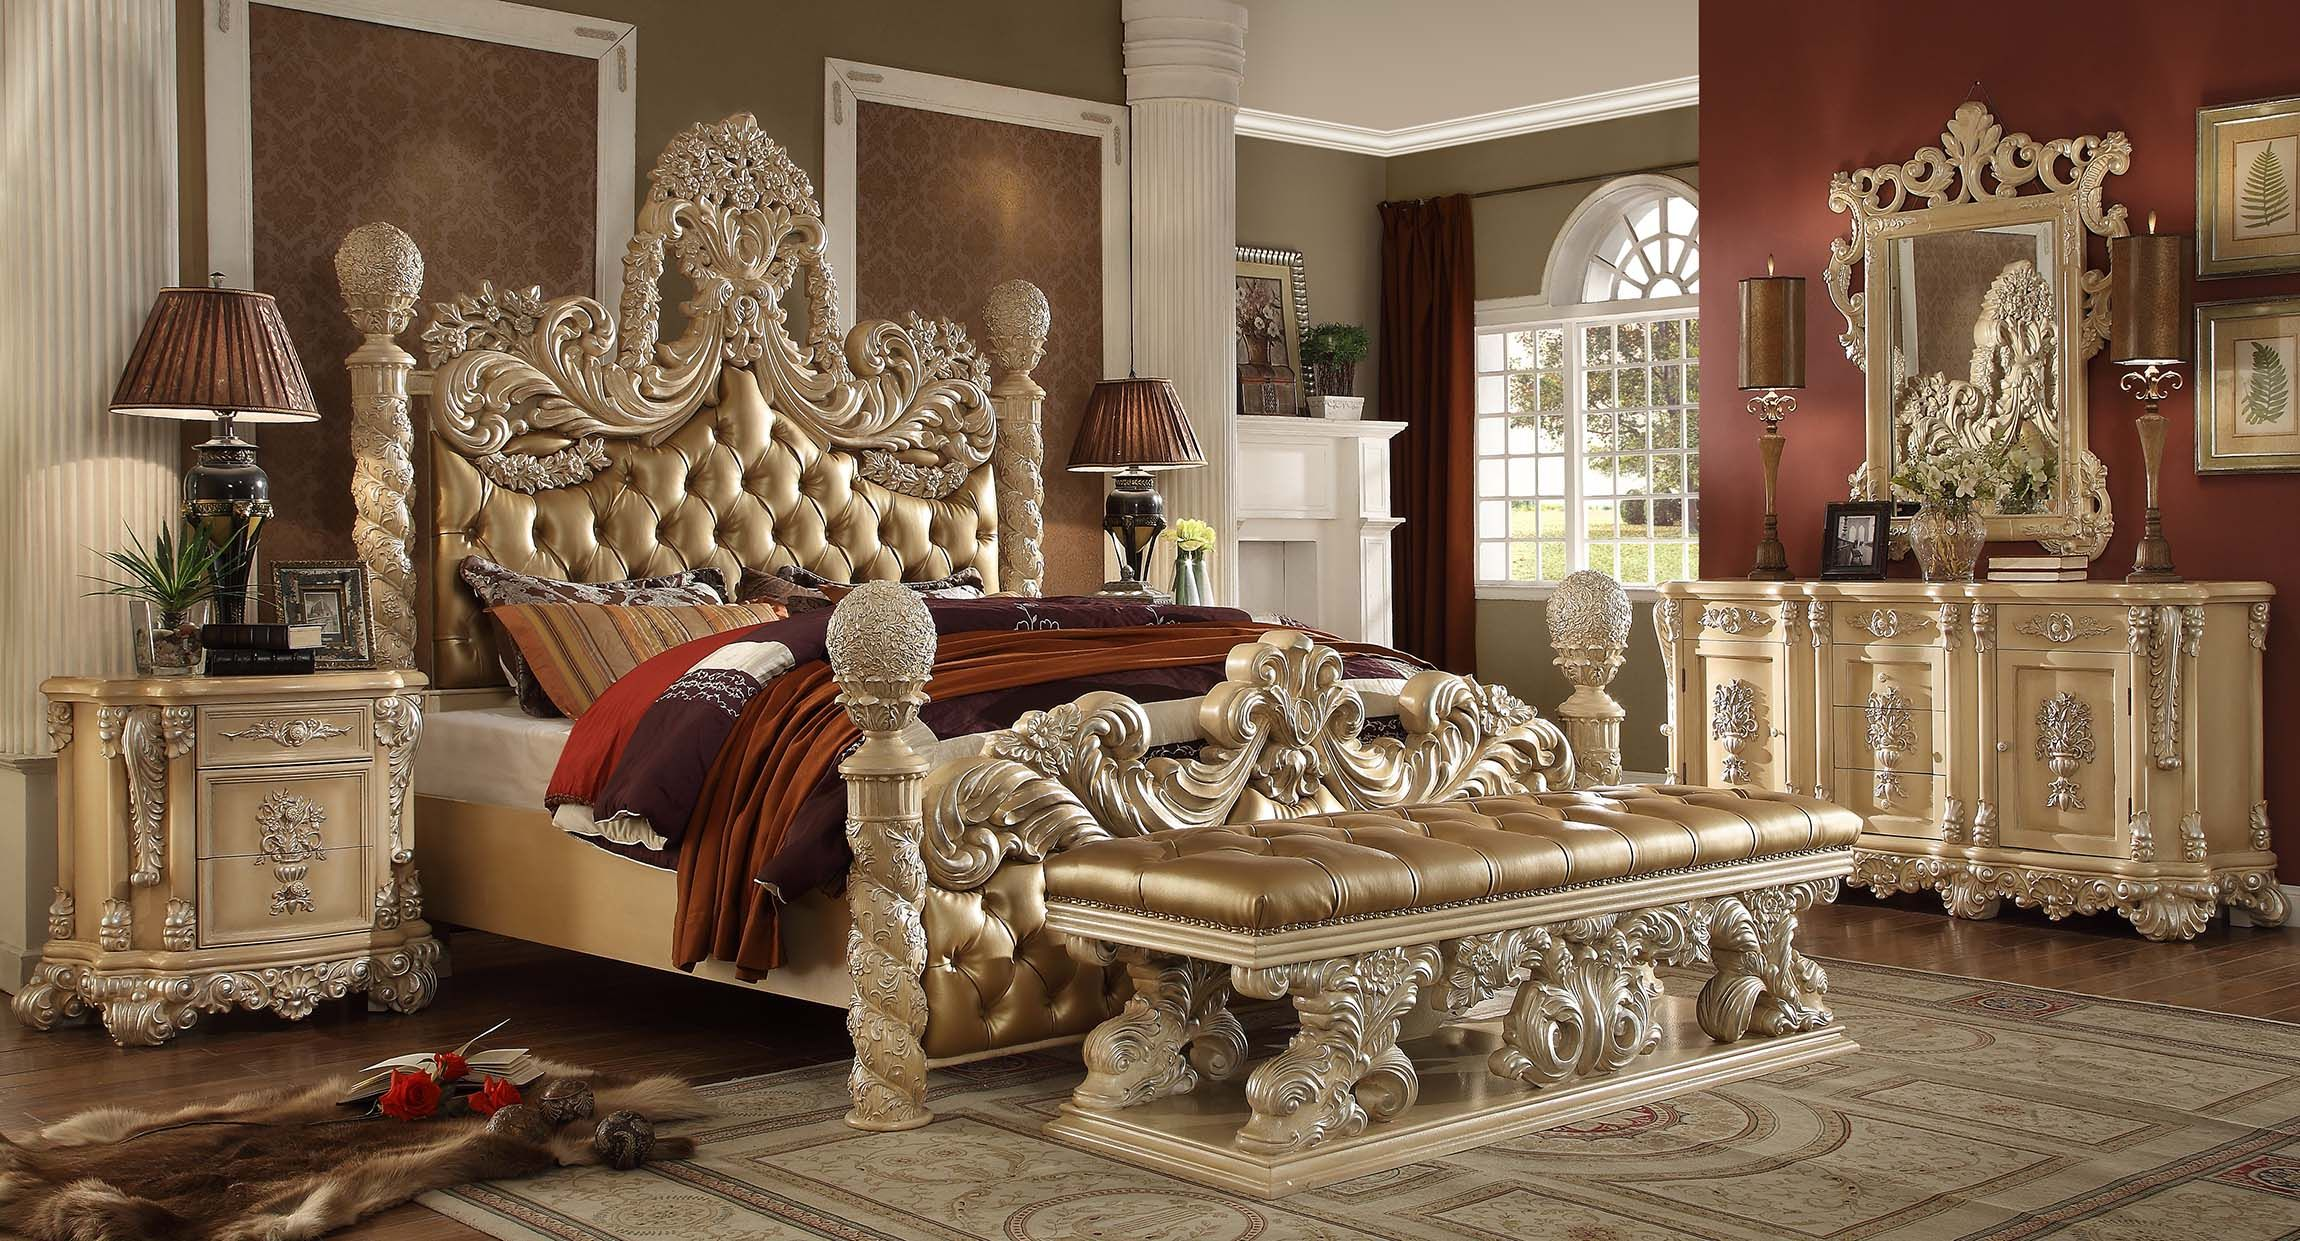 5 pc queen victoria renaissance style antique silver queen - Renaissance style bedroom furniture ...